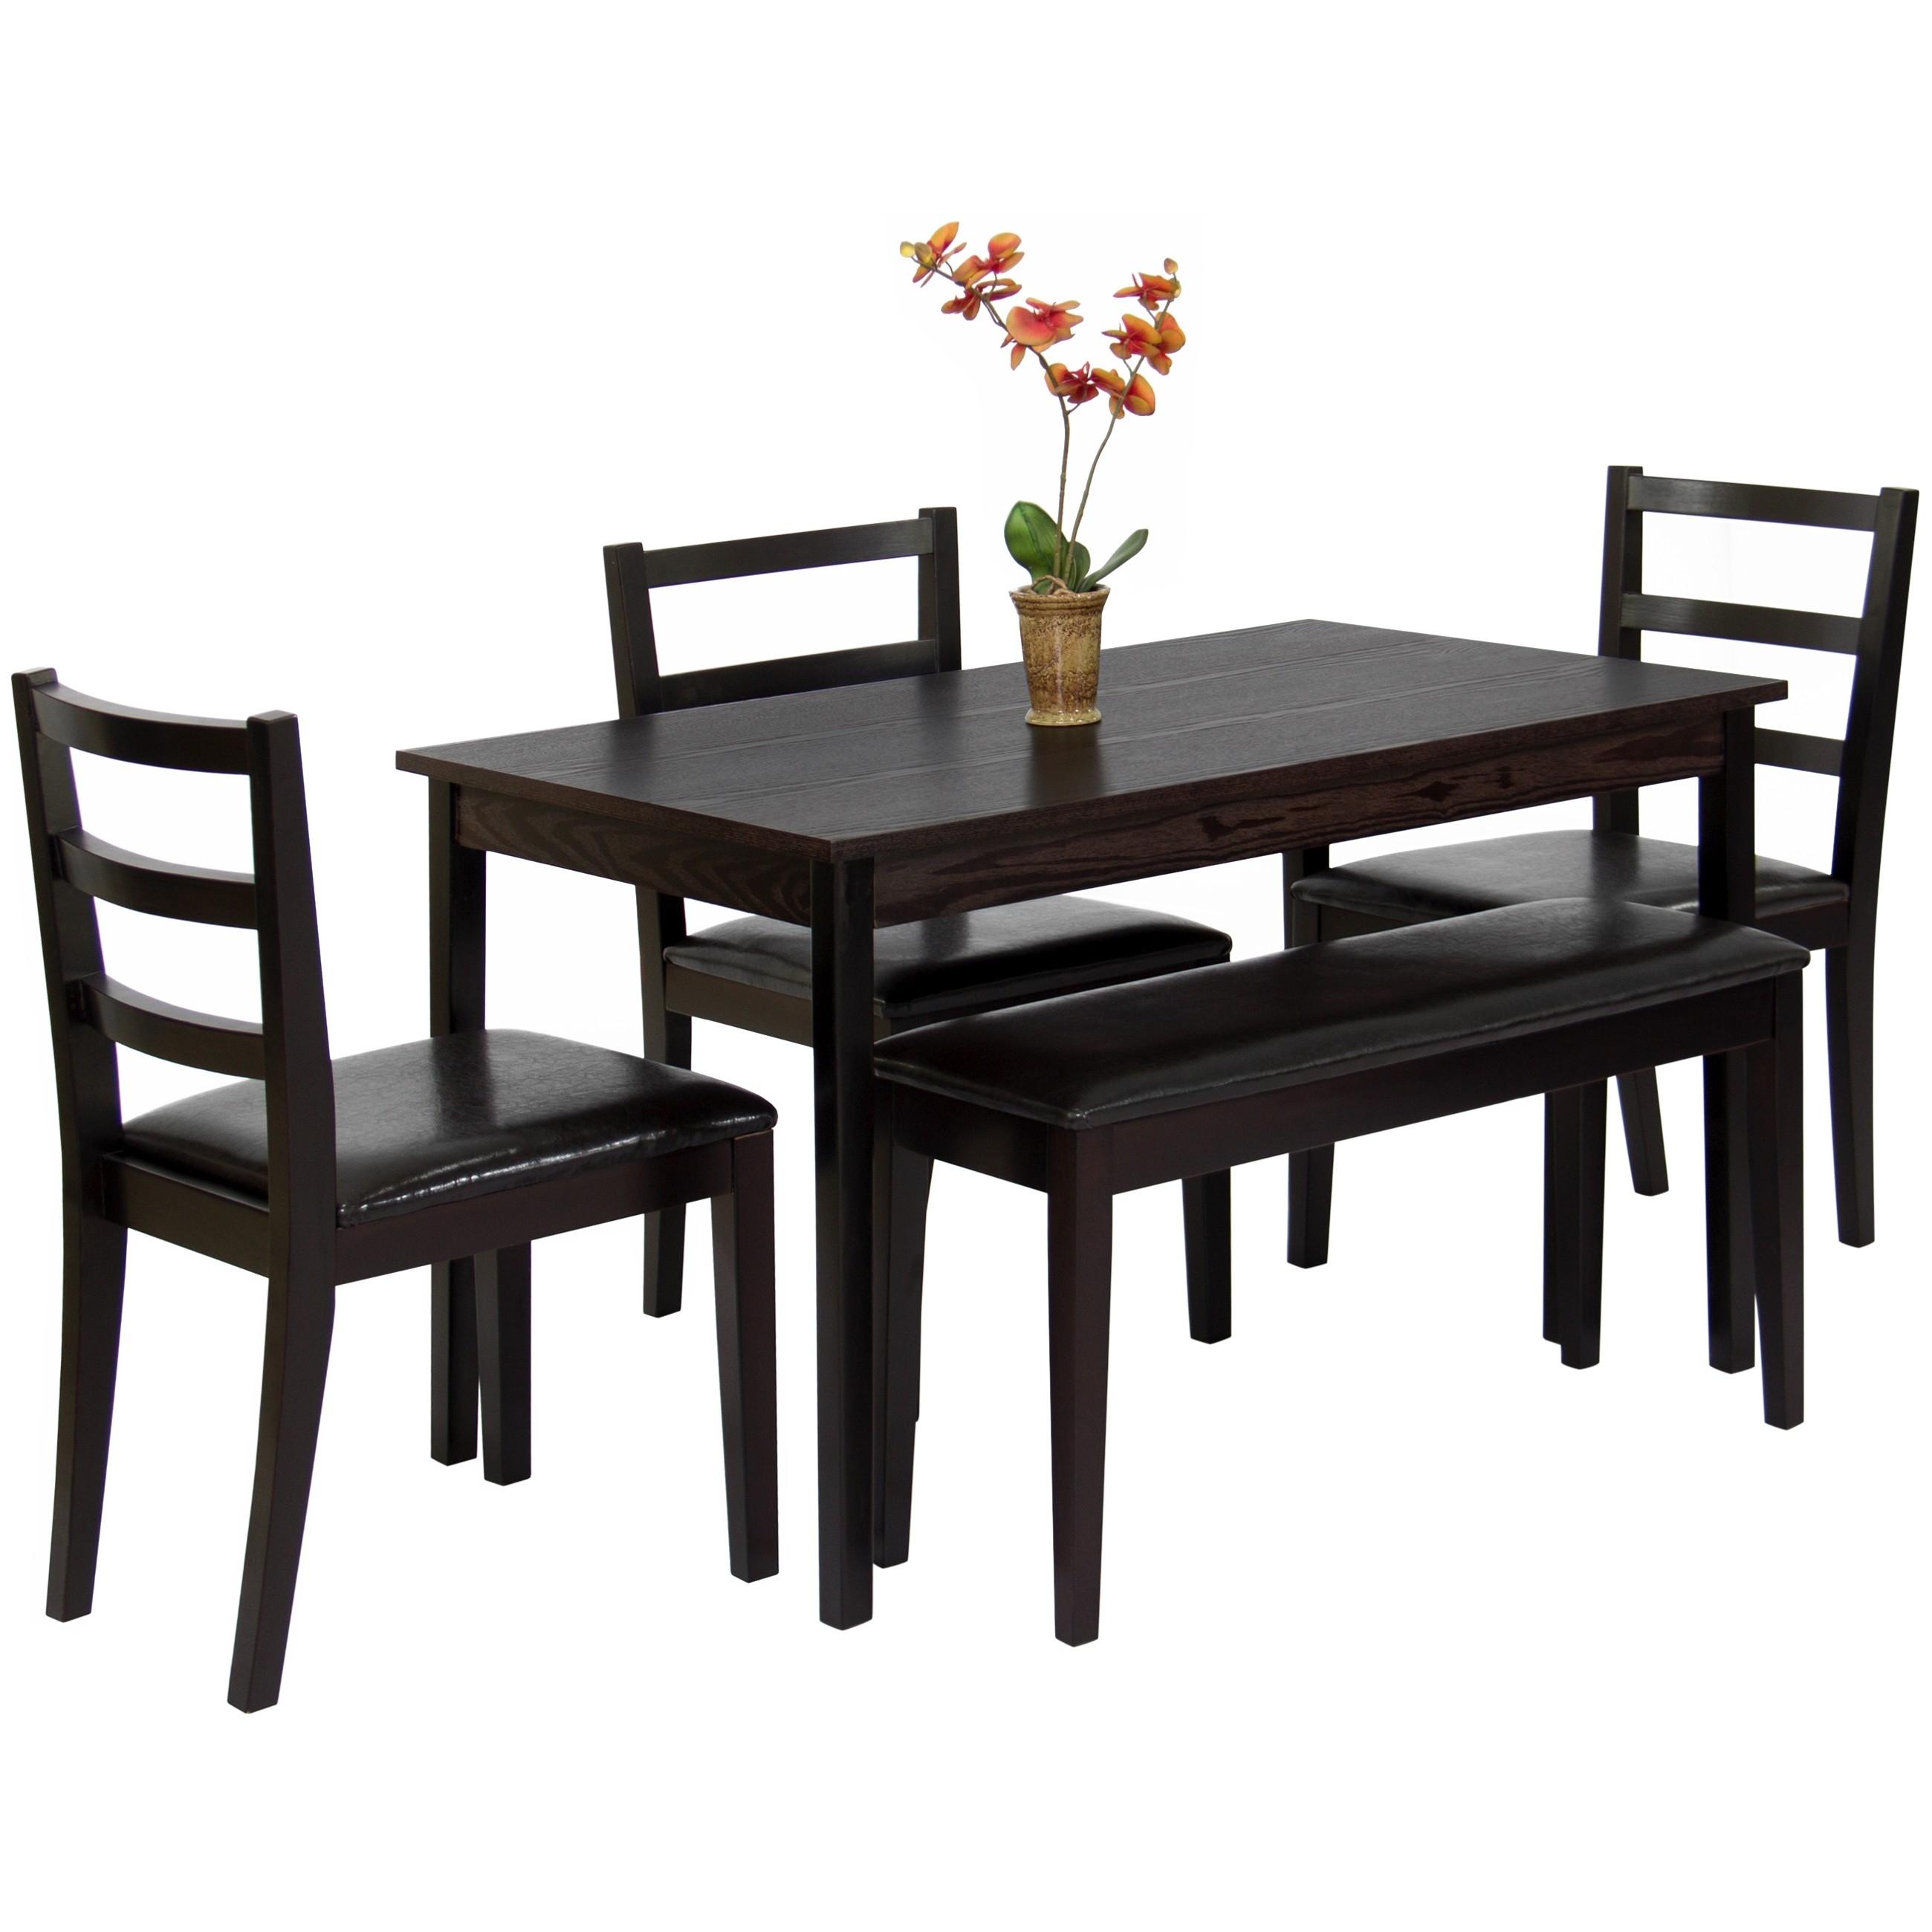 17 Beautiful 5 Piece Wood Dining Set | Interiorz (View 10 of 20)